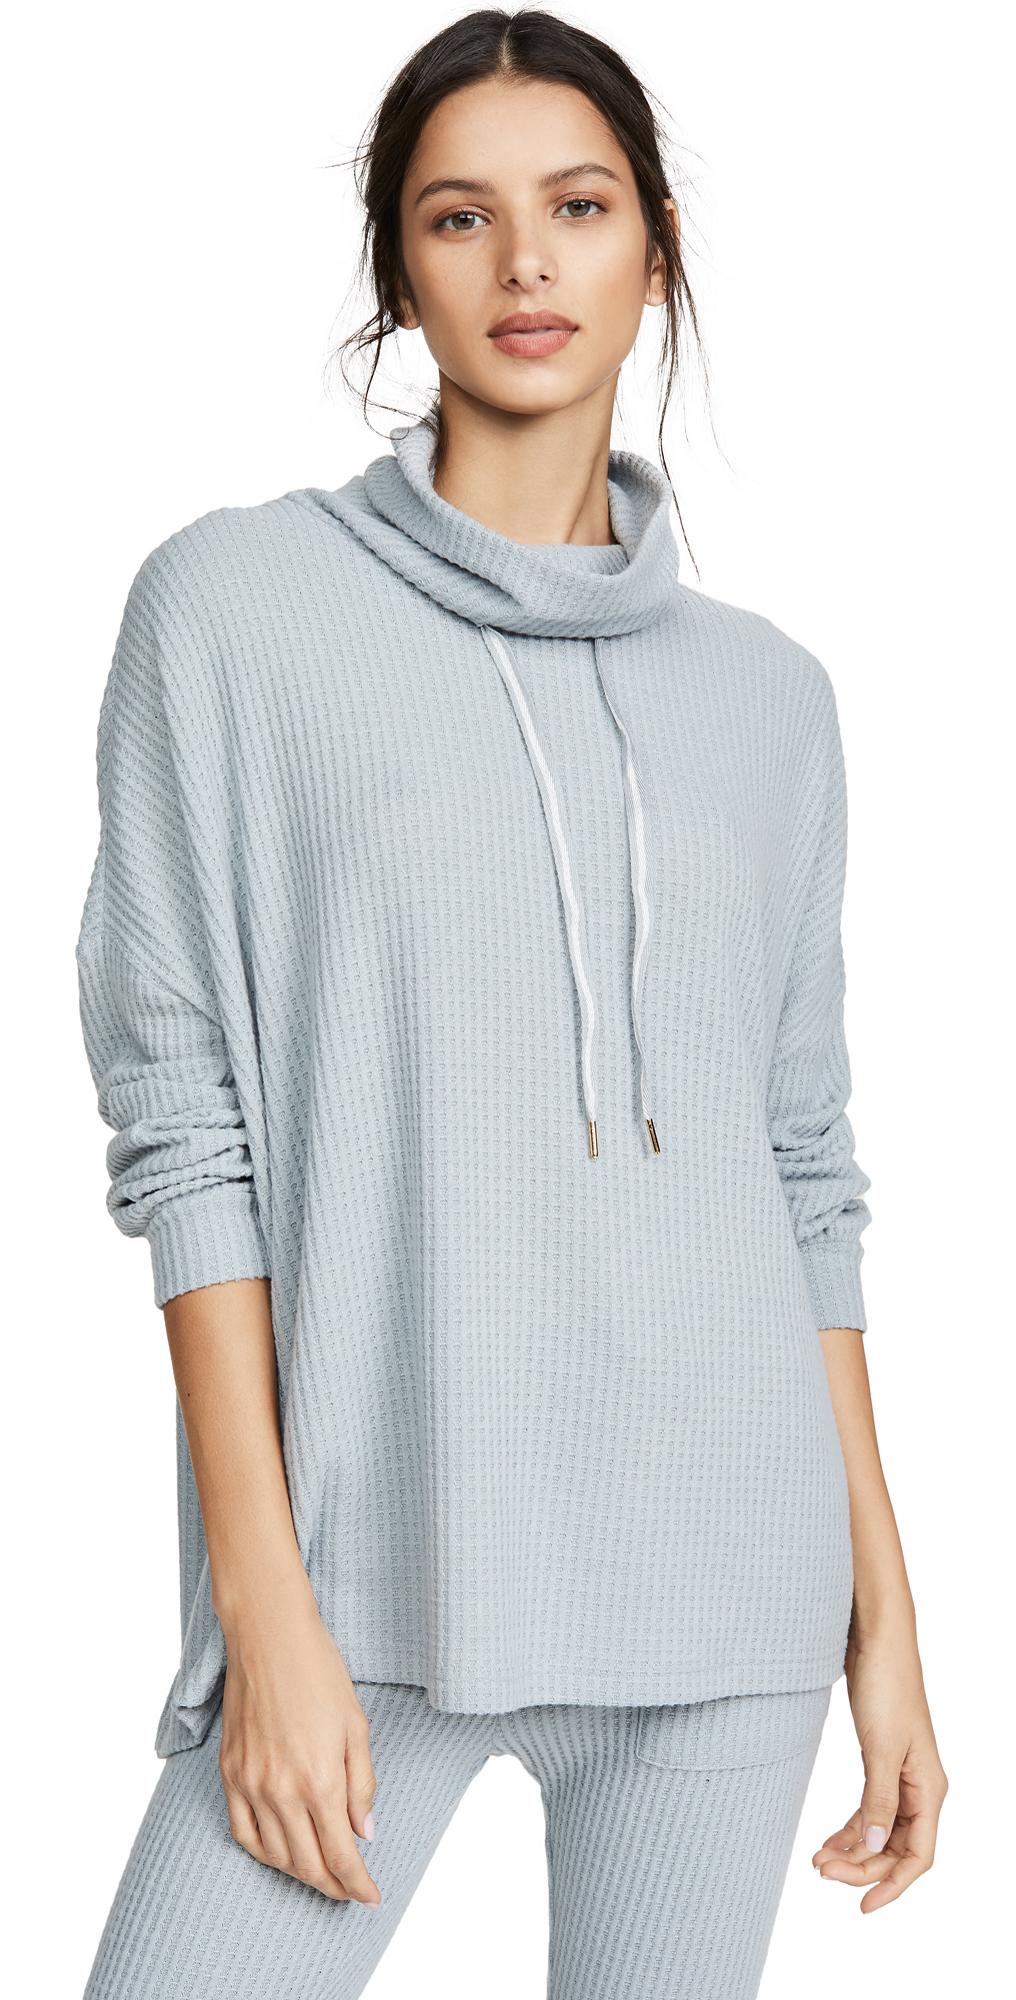 Honeydew Intimates Lounge Pro Pullover Top